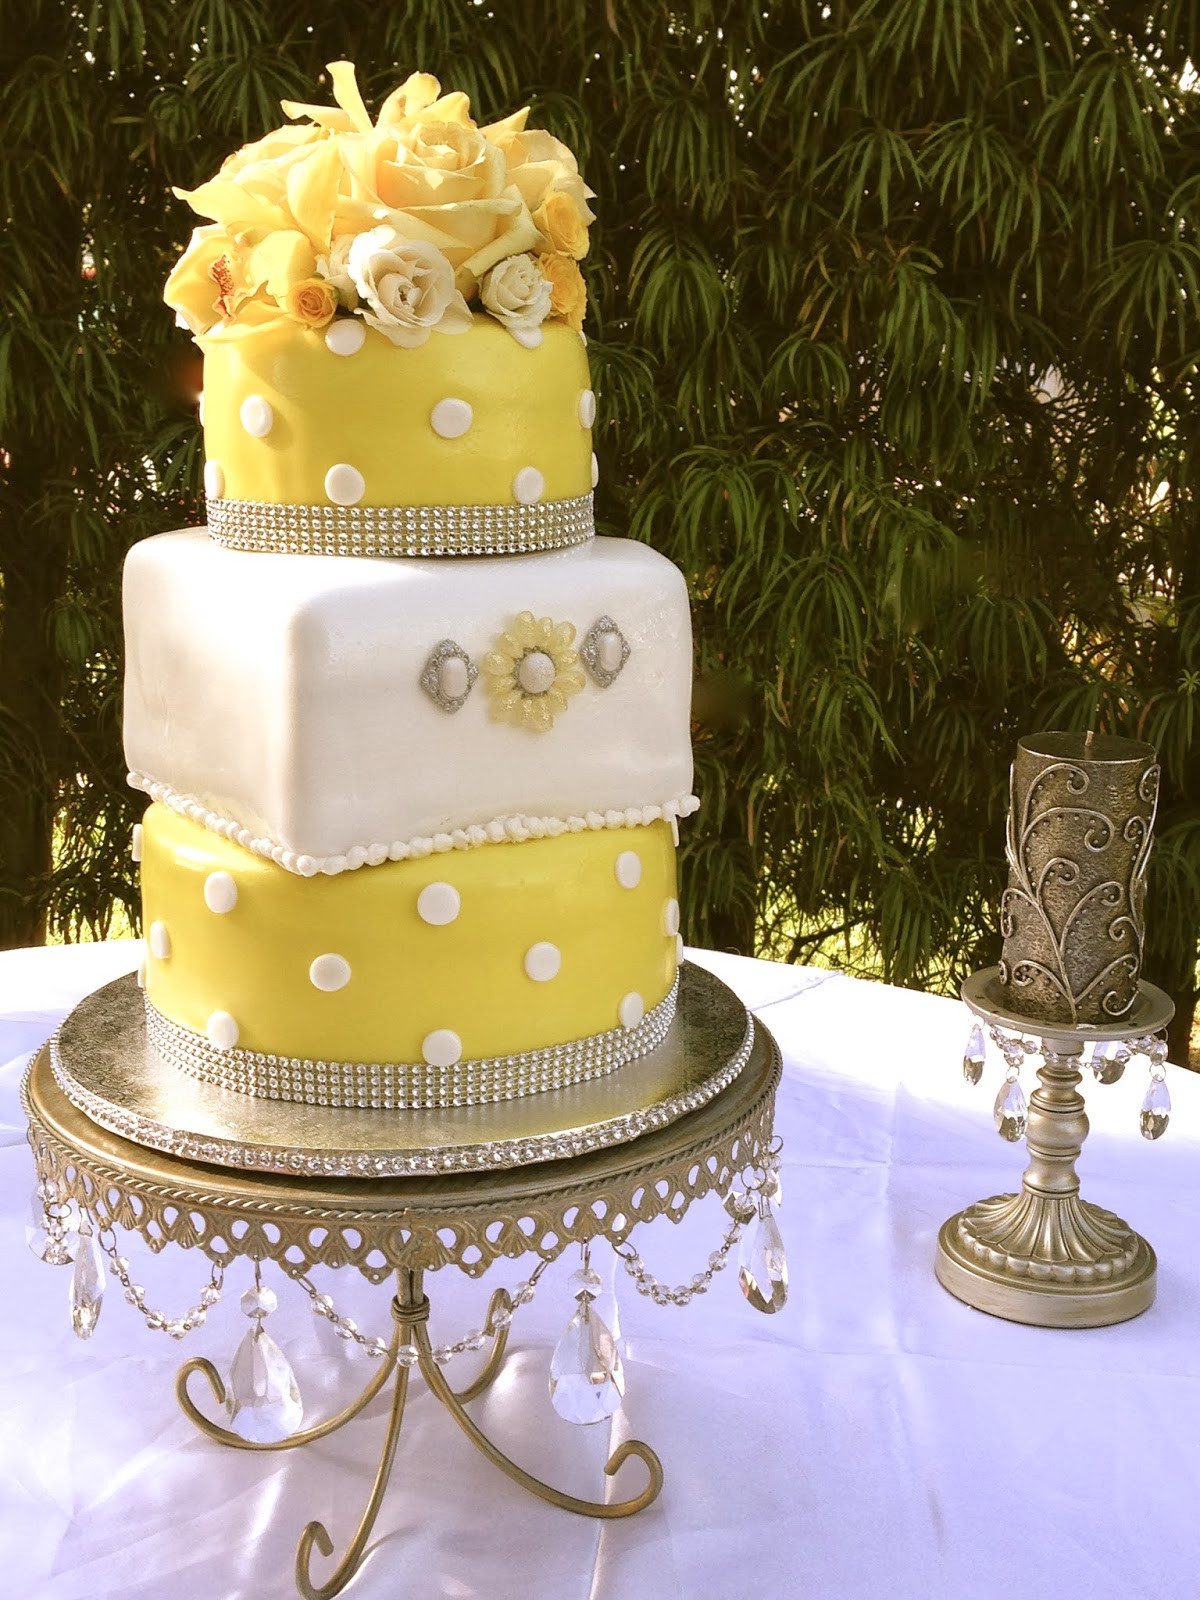 Polka Dots Wedding Cakes  Plumeria Cake Studio Yellow Polka Dot Wedding Cake and Treats